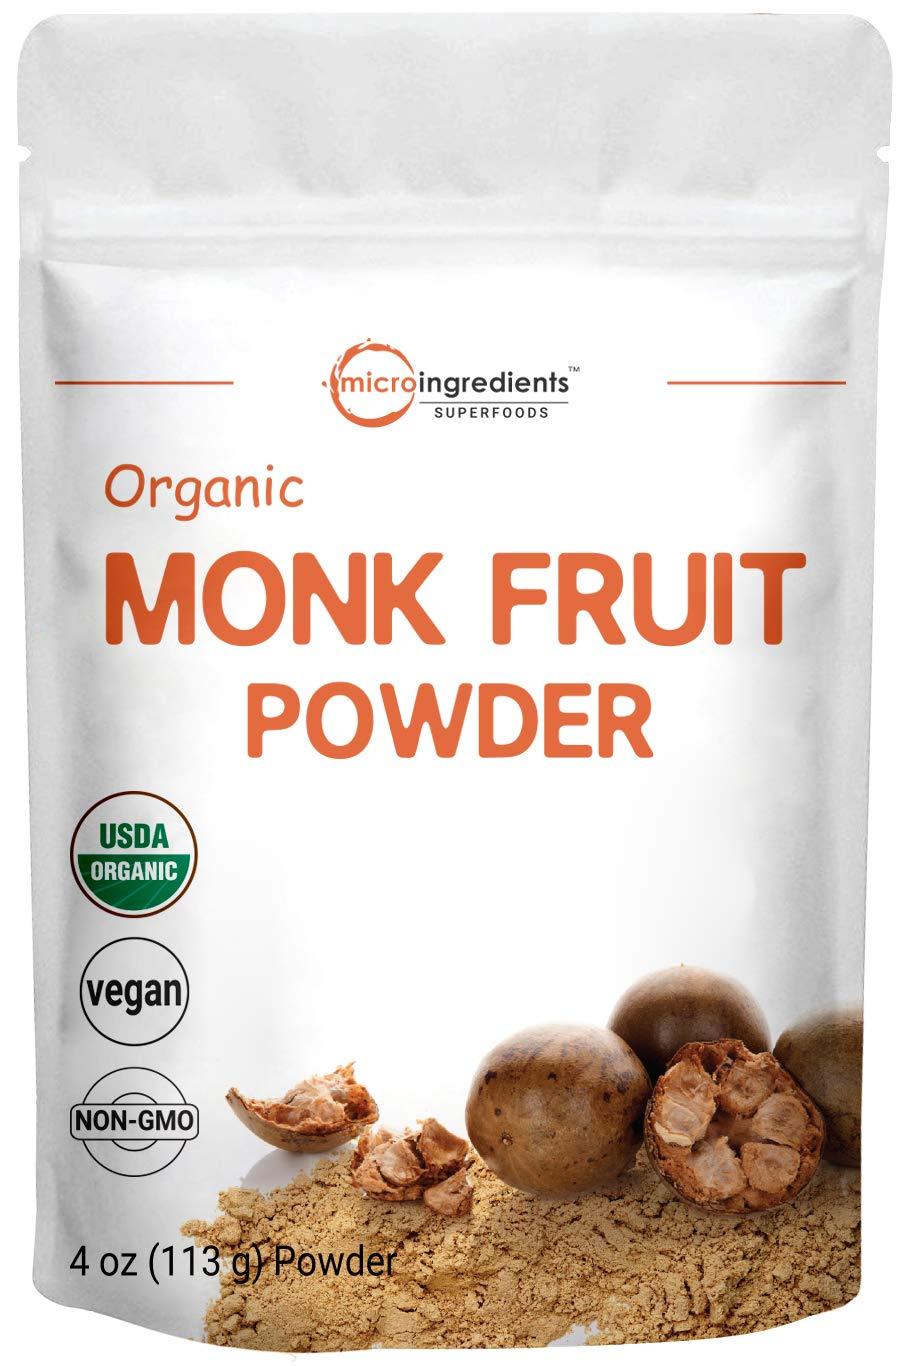 USDA Organic Monk Fruit Powder, 4 Ounce (113 Grams), Zero Calorie, Zero Carb, Sugar Alternative, Monk Fruit Keto Diet, Perfect Paleo & Low-Carb Dieters, Natural Sweetener, Vegan